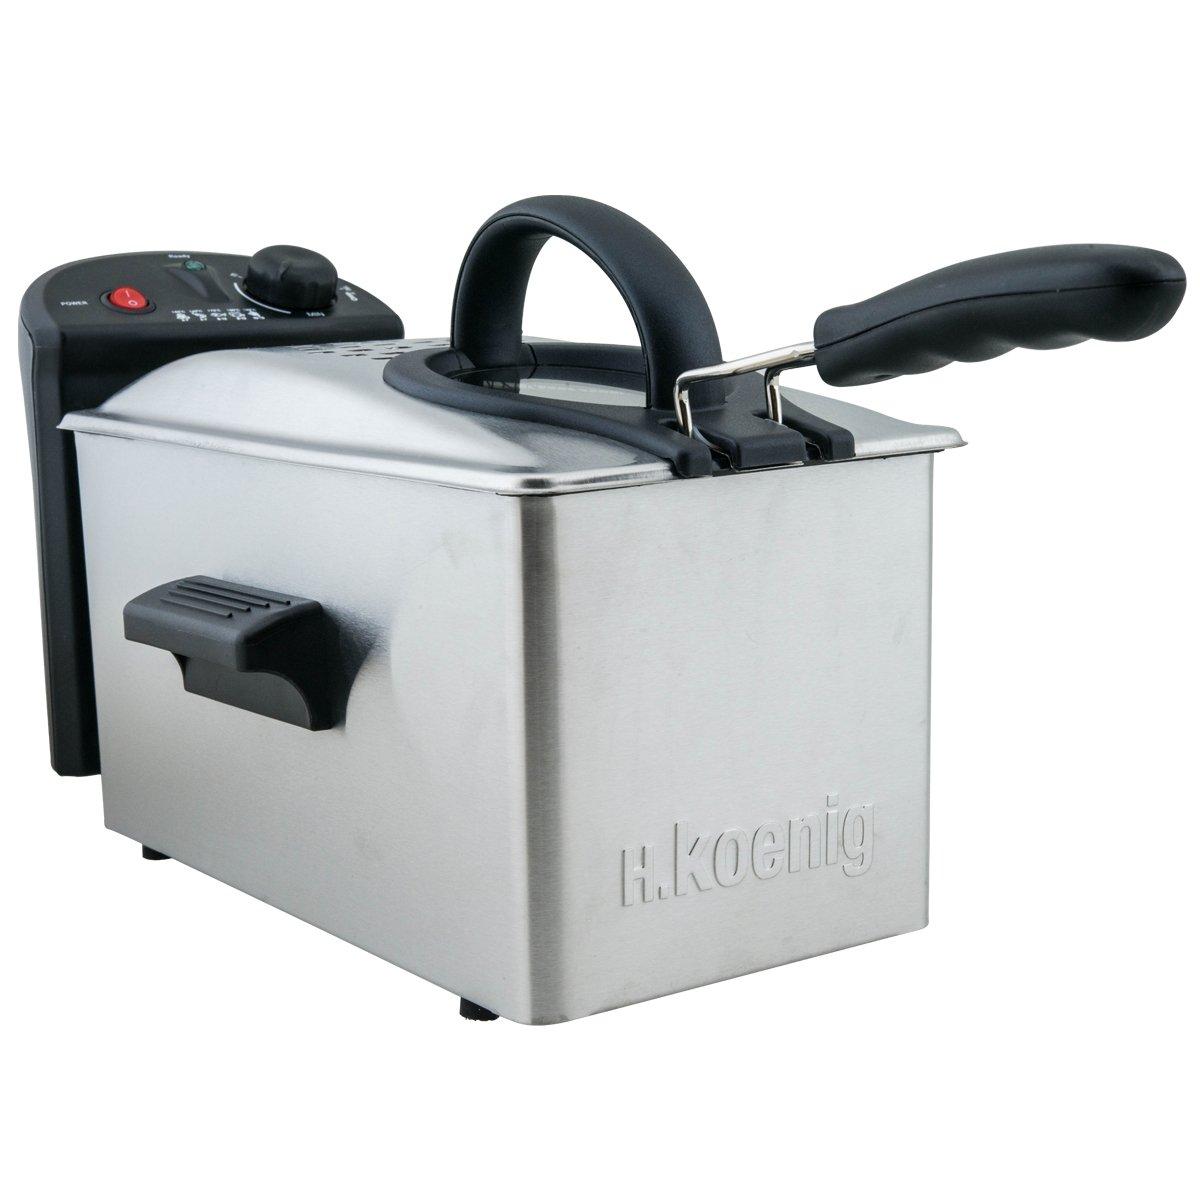 H.Koenig DFX300 DFX300-Freidora Profesional, 2100 W, Acero Inoxidable: Amazon.es: Hogar